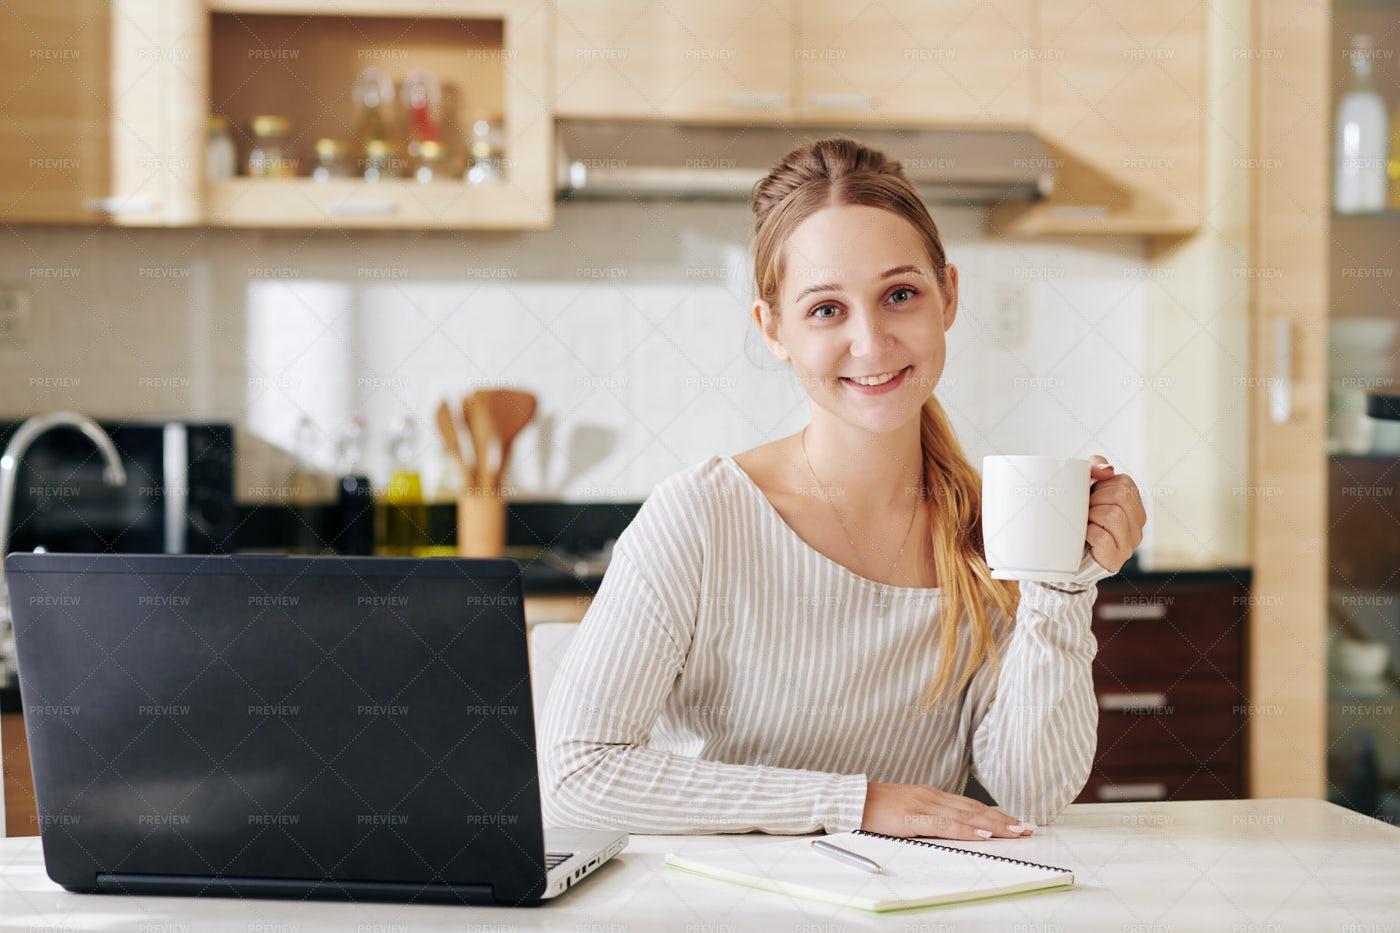 Pretty Woman At Kitchen Table: Stock Photos